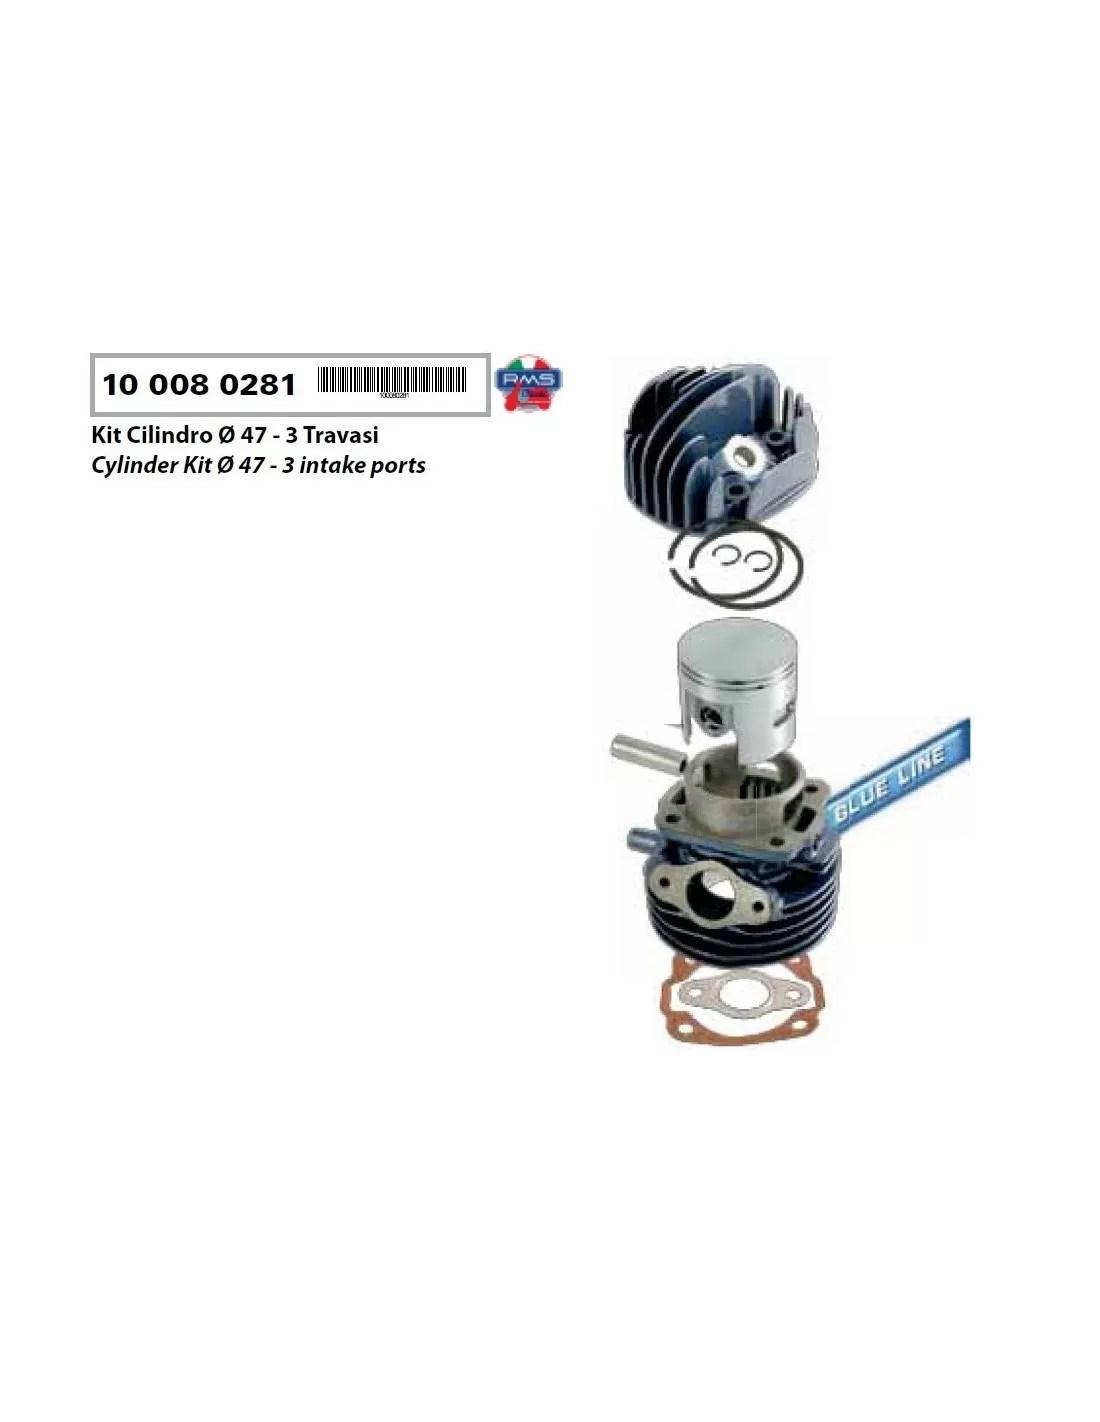 gilindro és a dugattyú piaggio vespa 75cc pk speciális